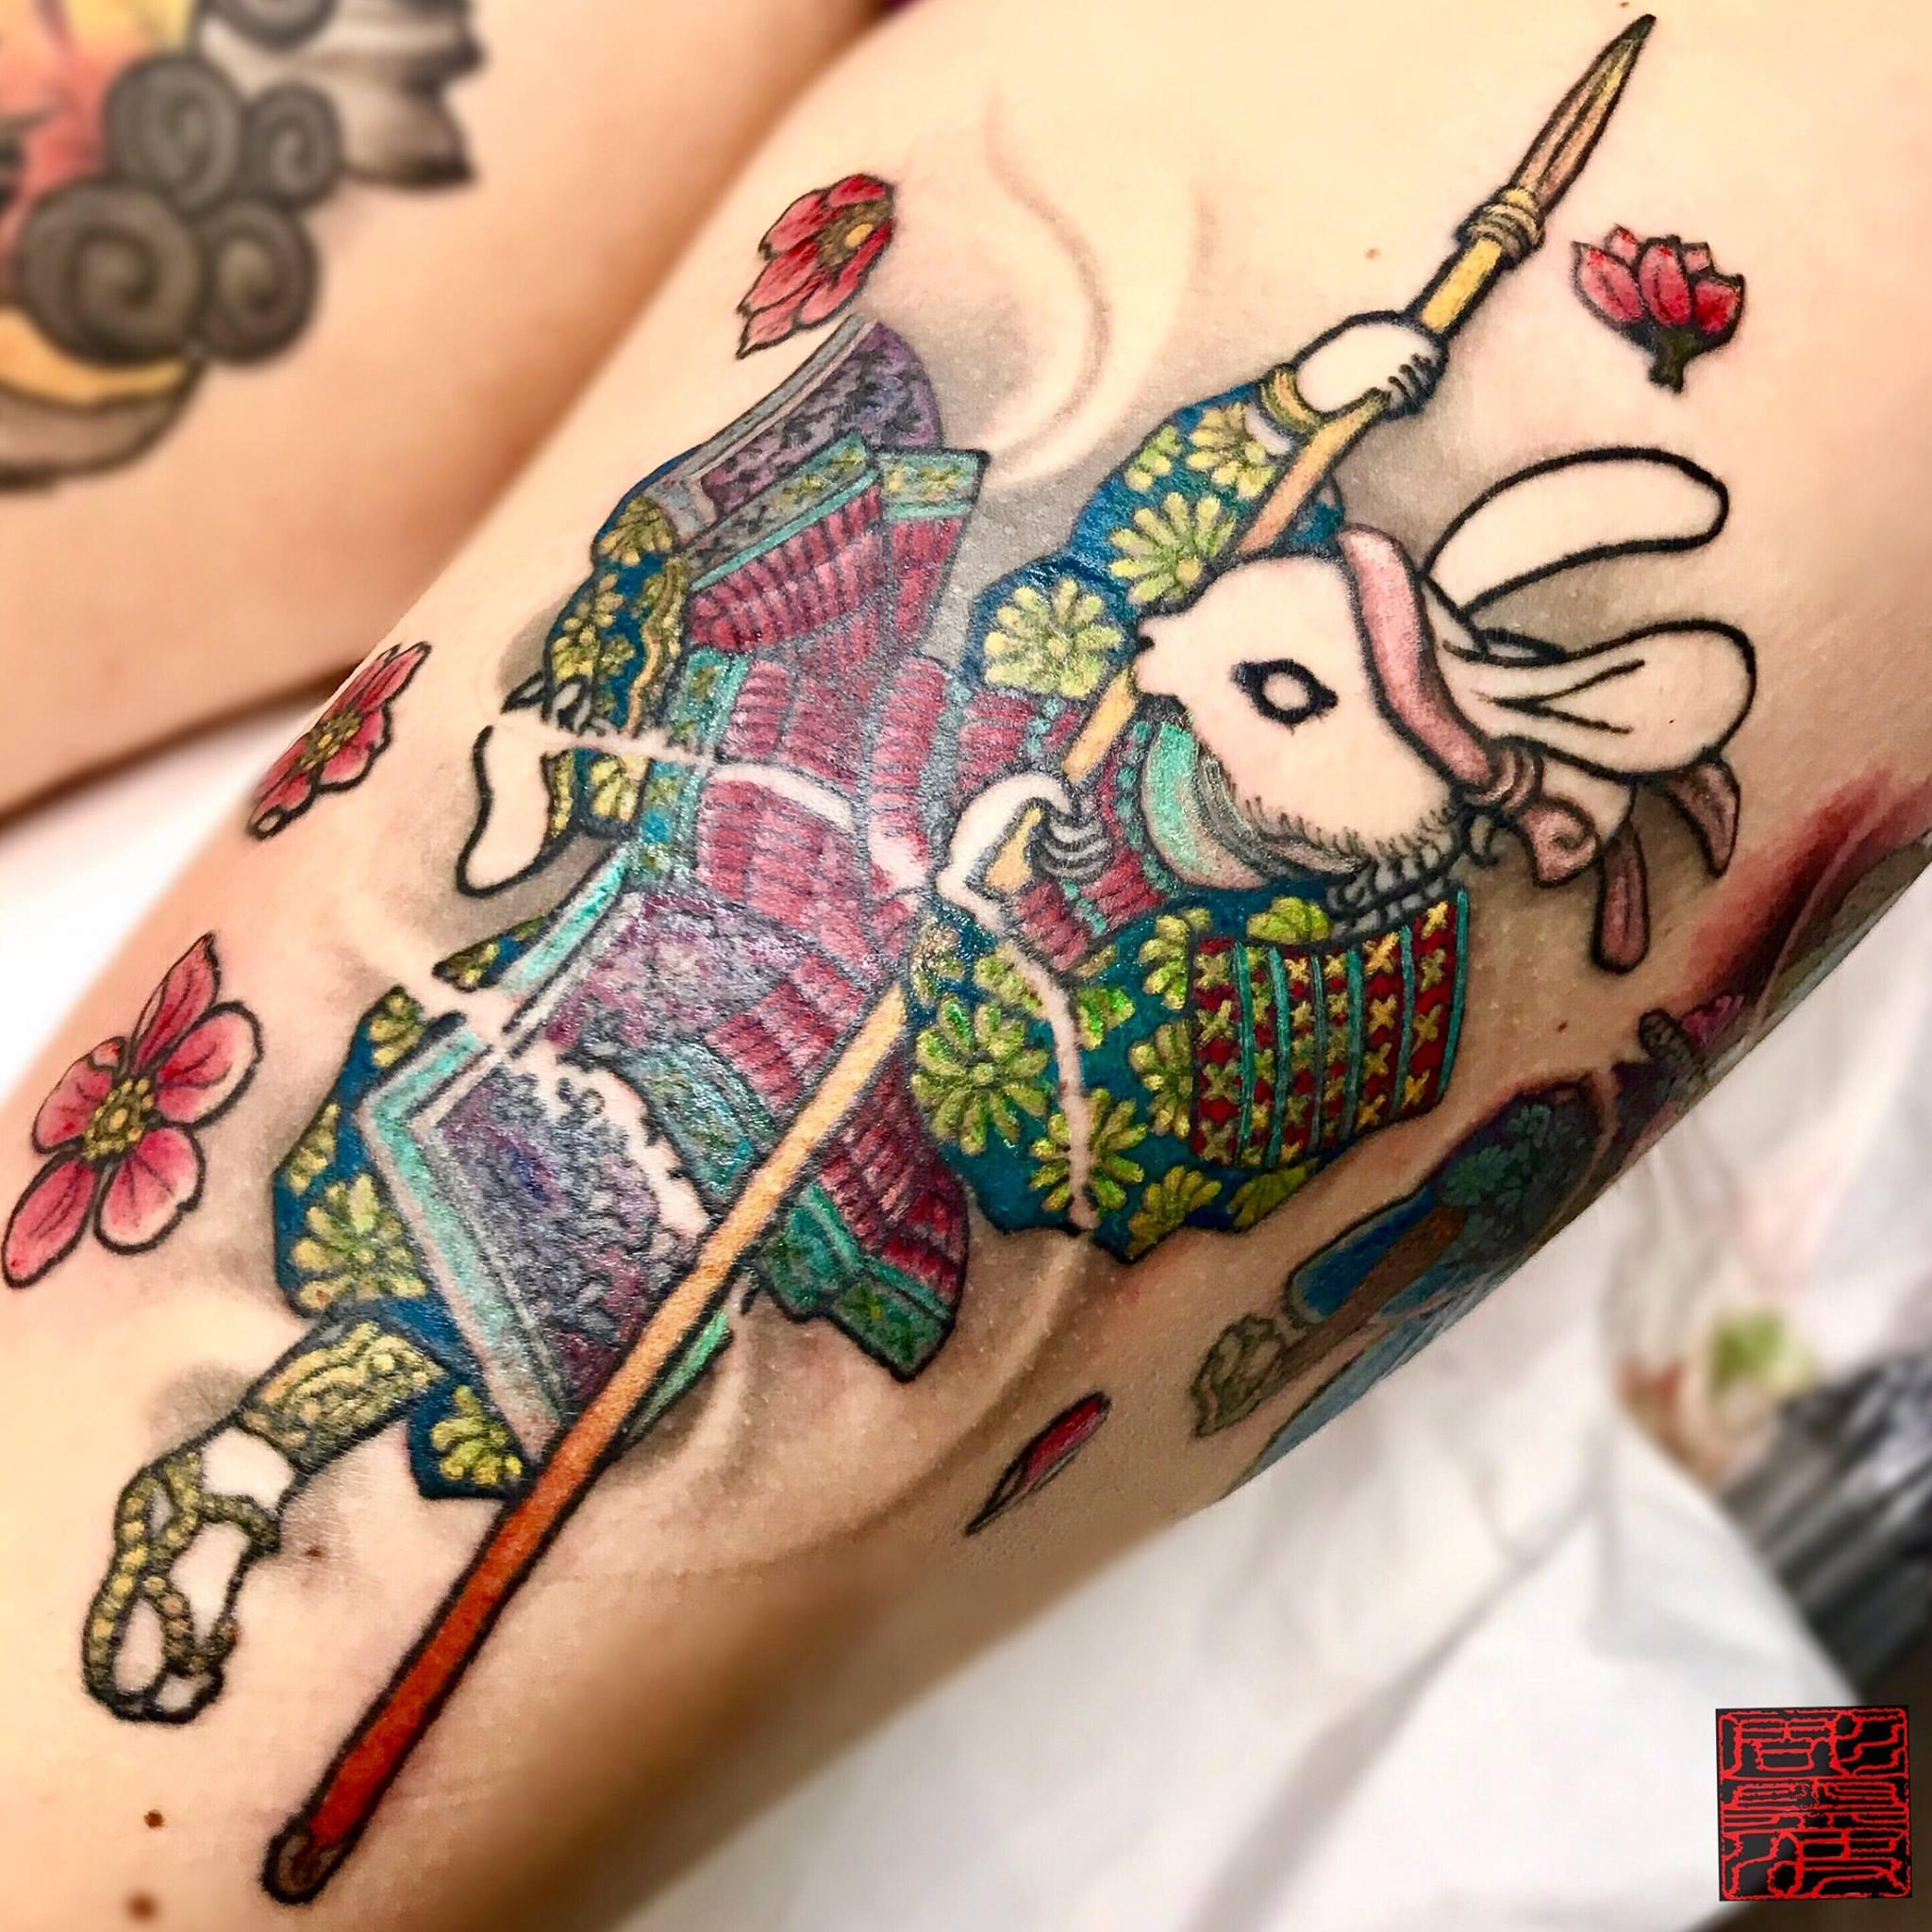 Inksearch tattoo Lepa Dinis (彫霊波)